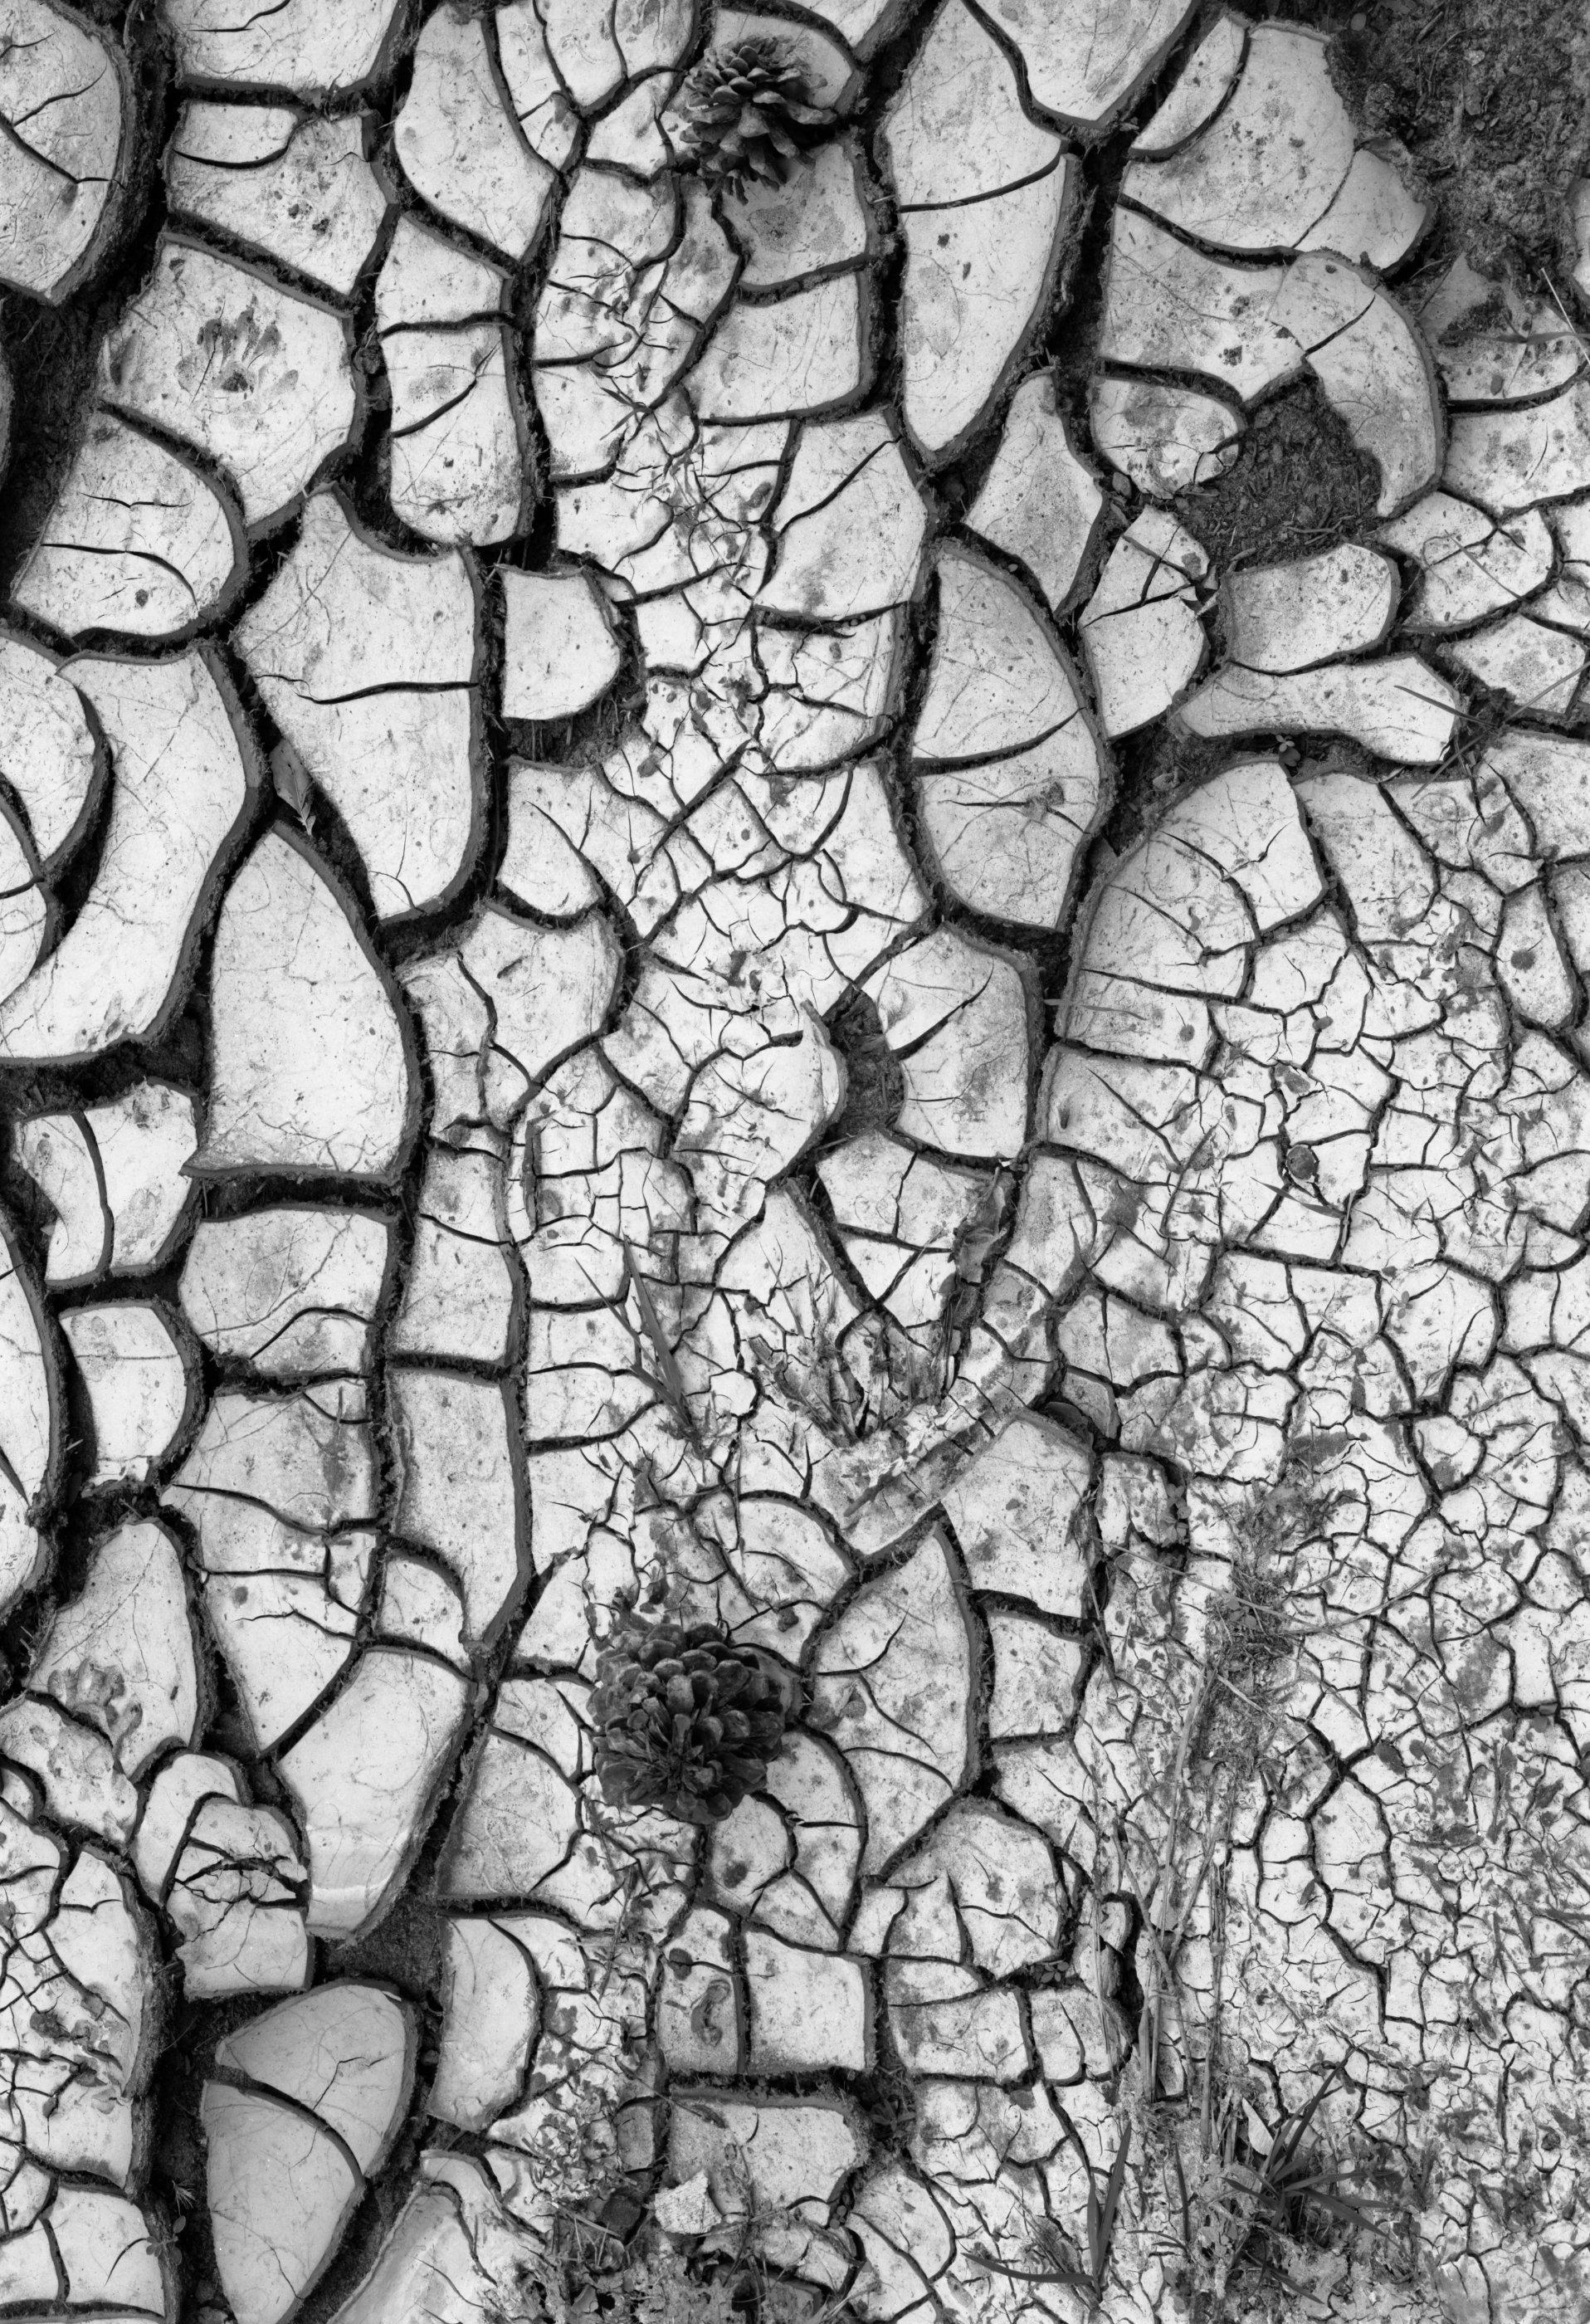 185_Dry_Mud.jpg